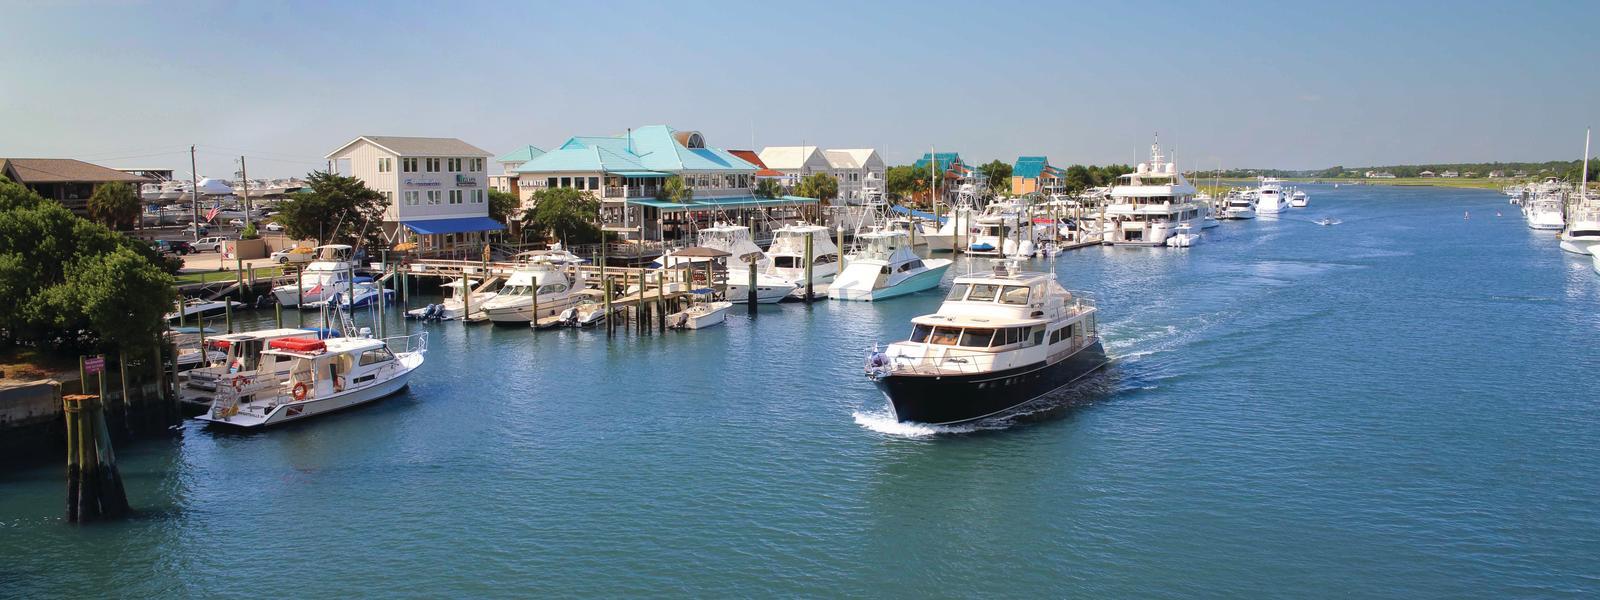 Holiday Vacation Rentals Wrightsville Beach